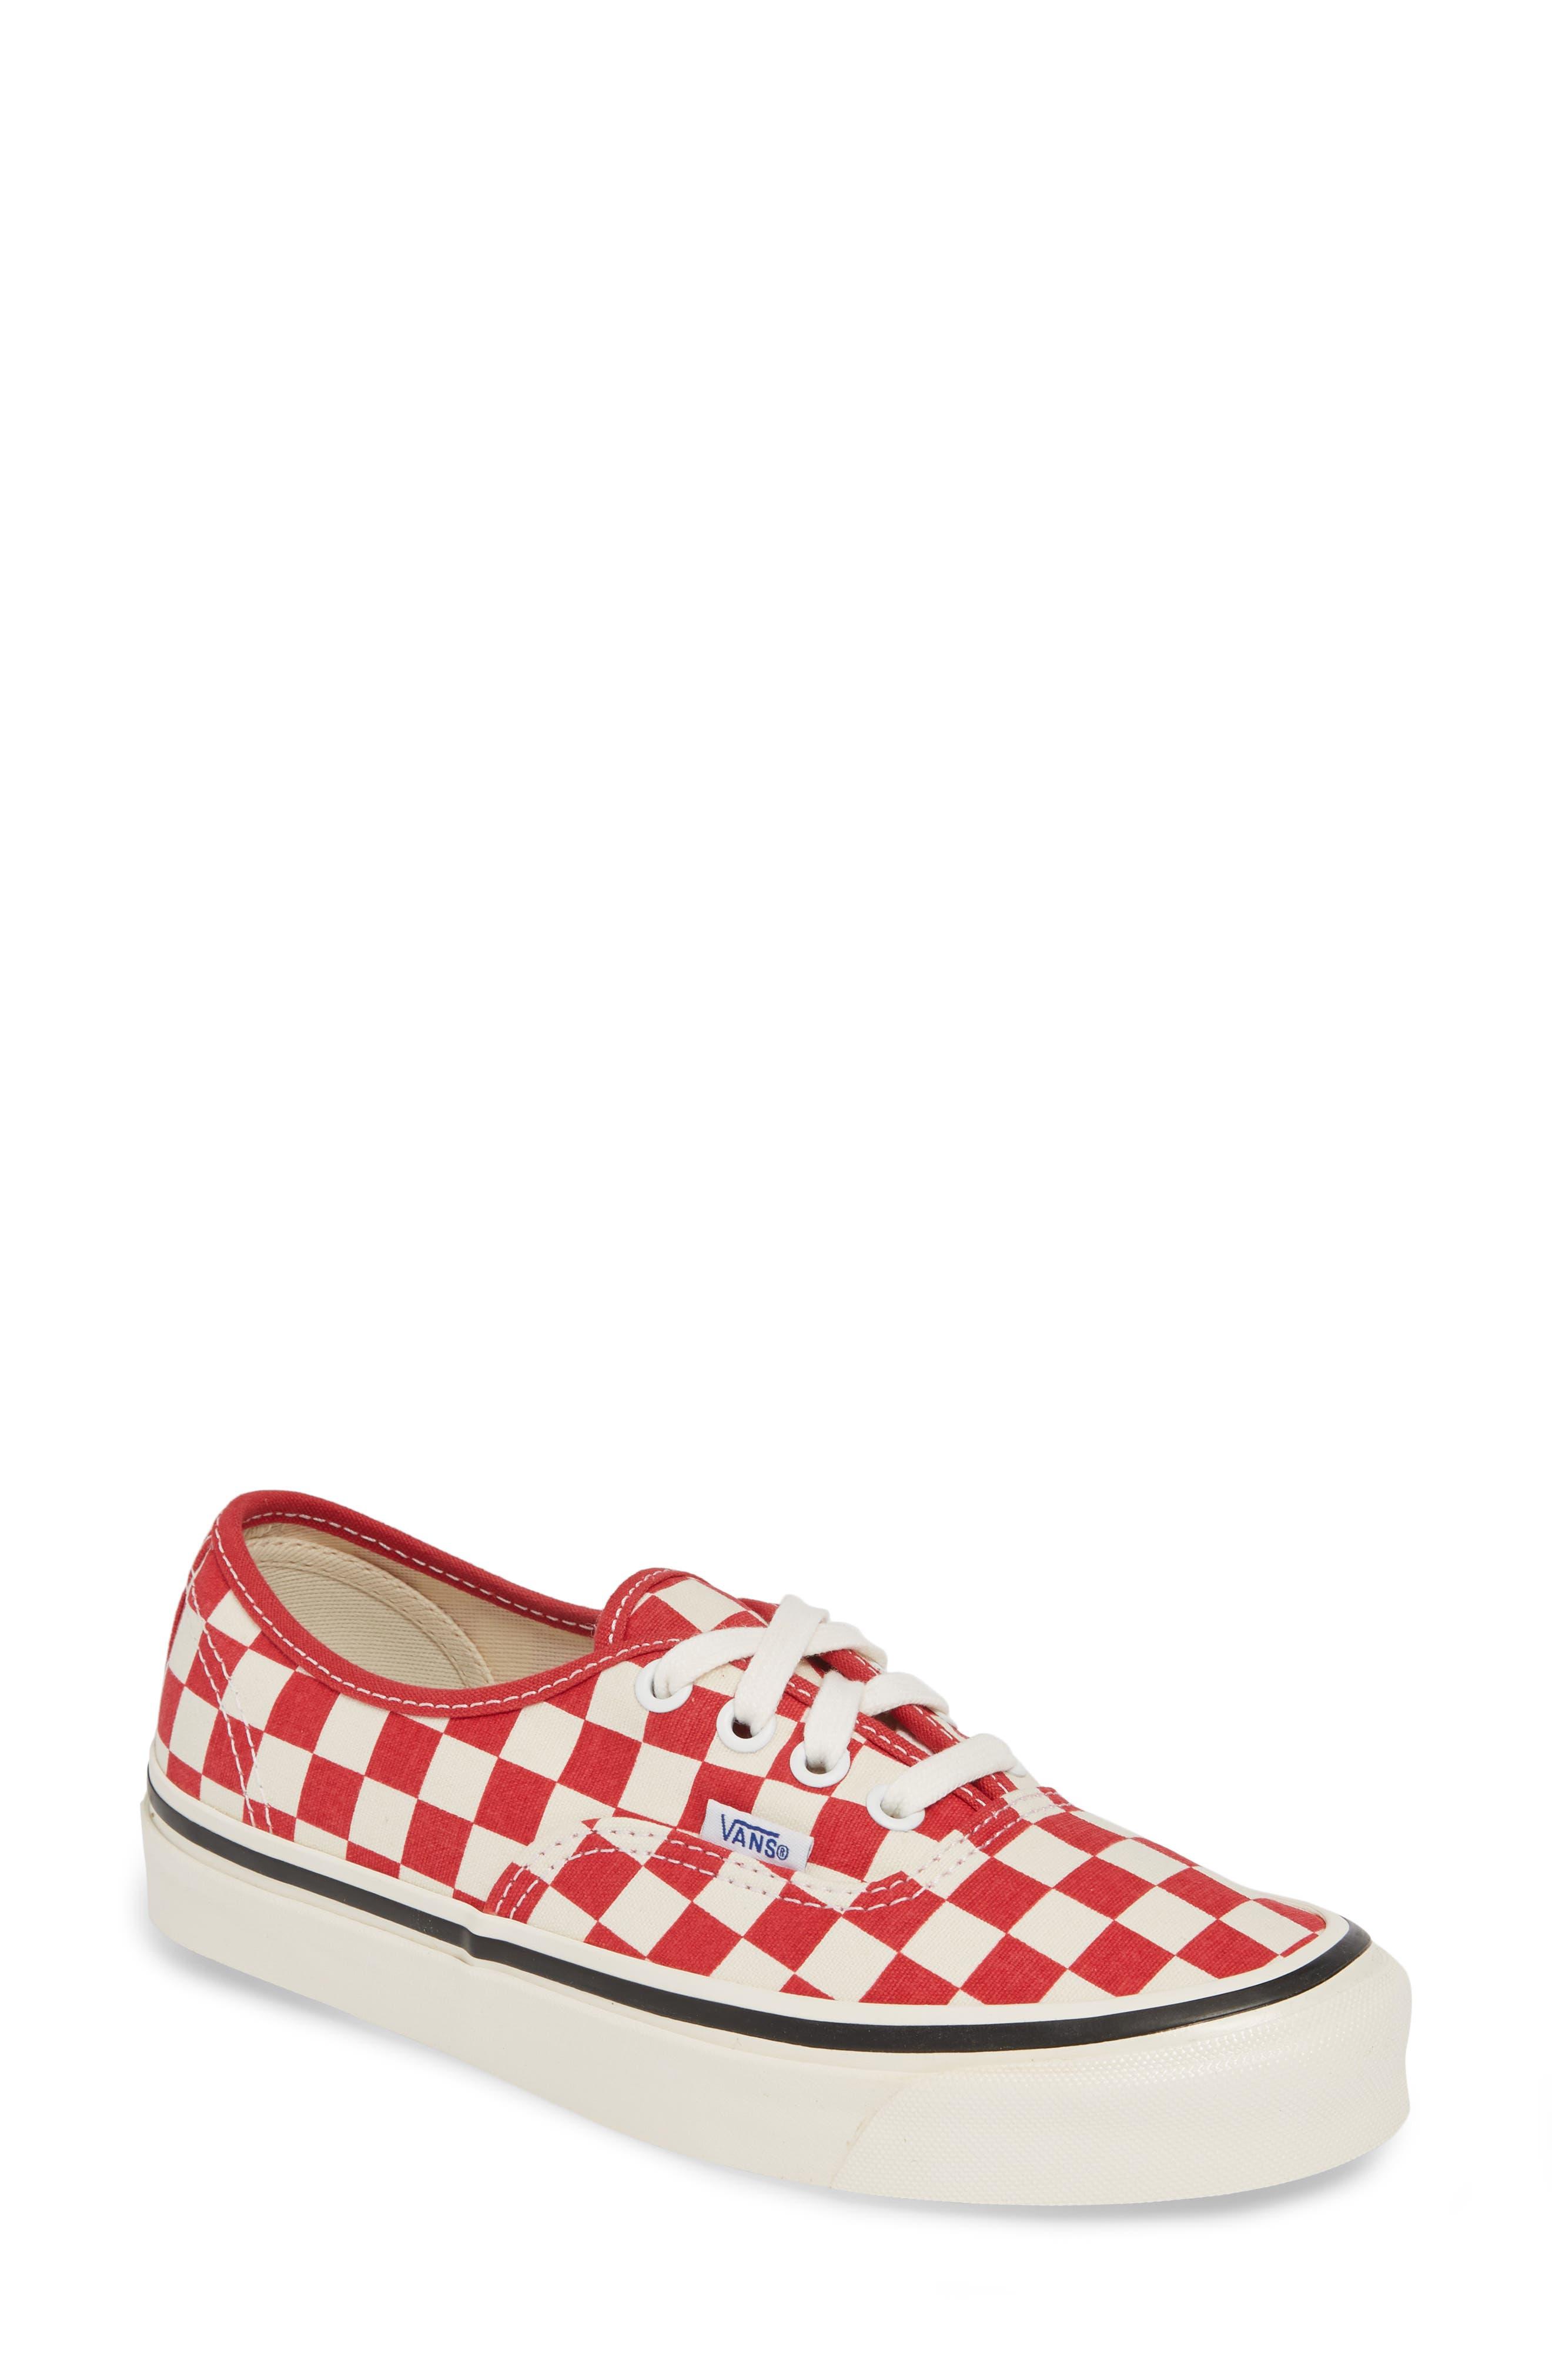 VANS, Authentic 44 DX Sneaker, Main thumbnail 1, color, RED/ CHECK